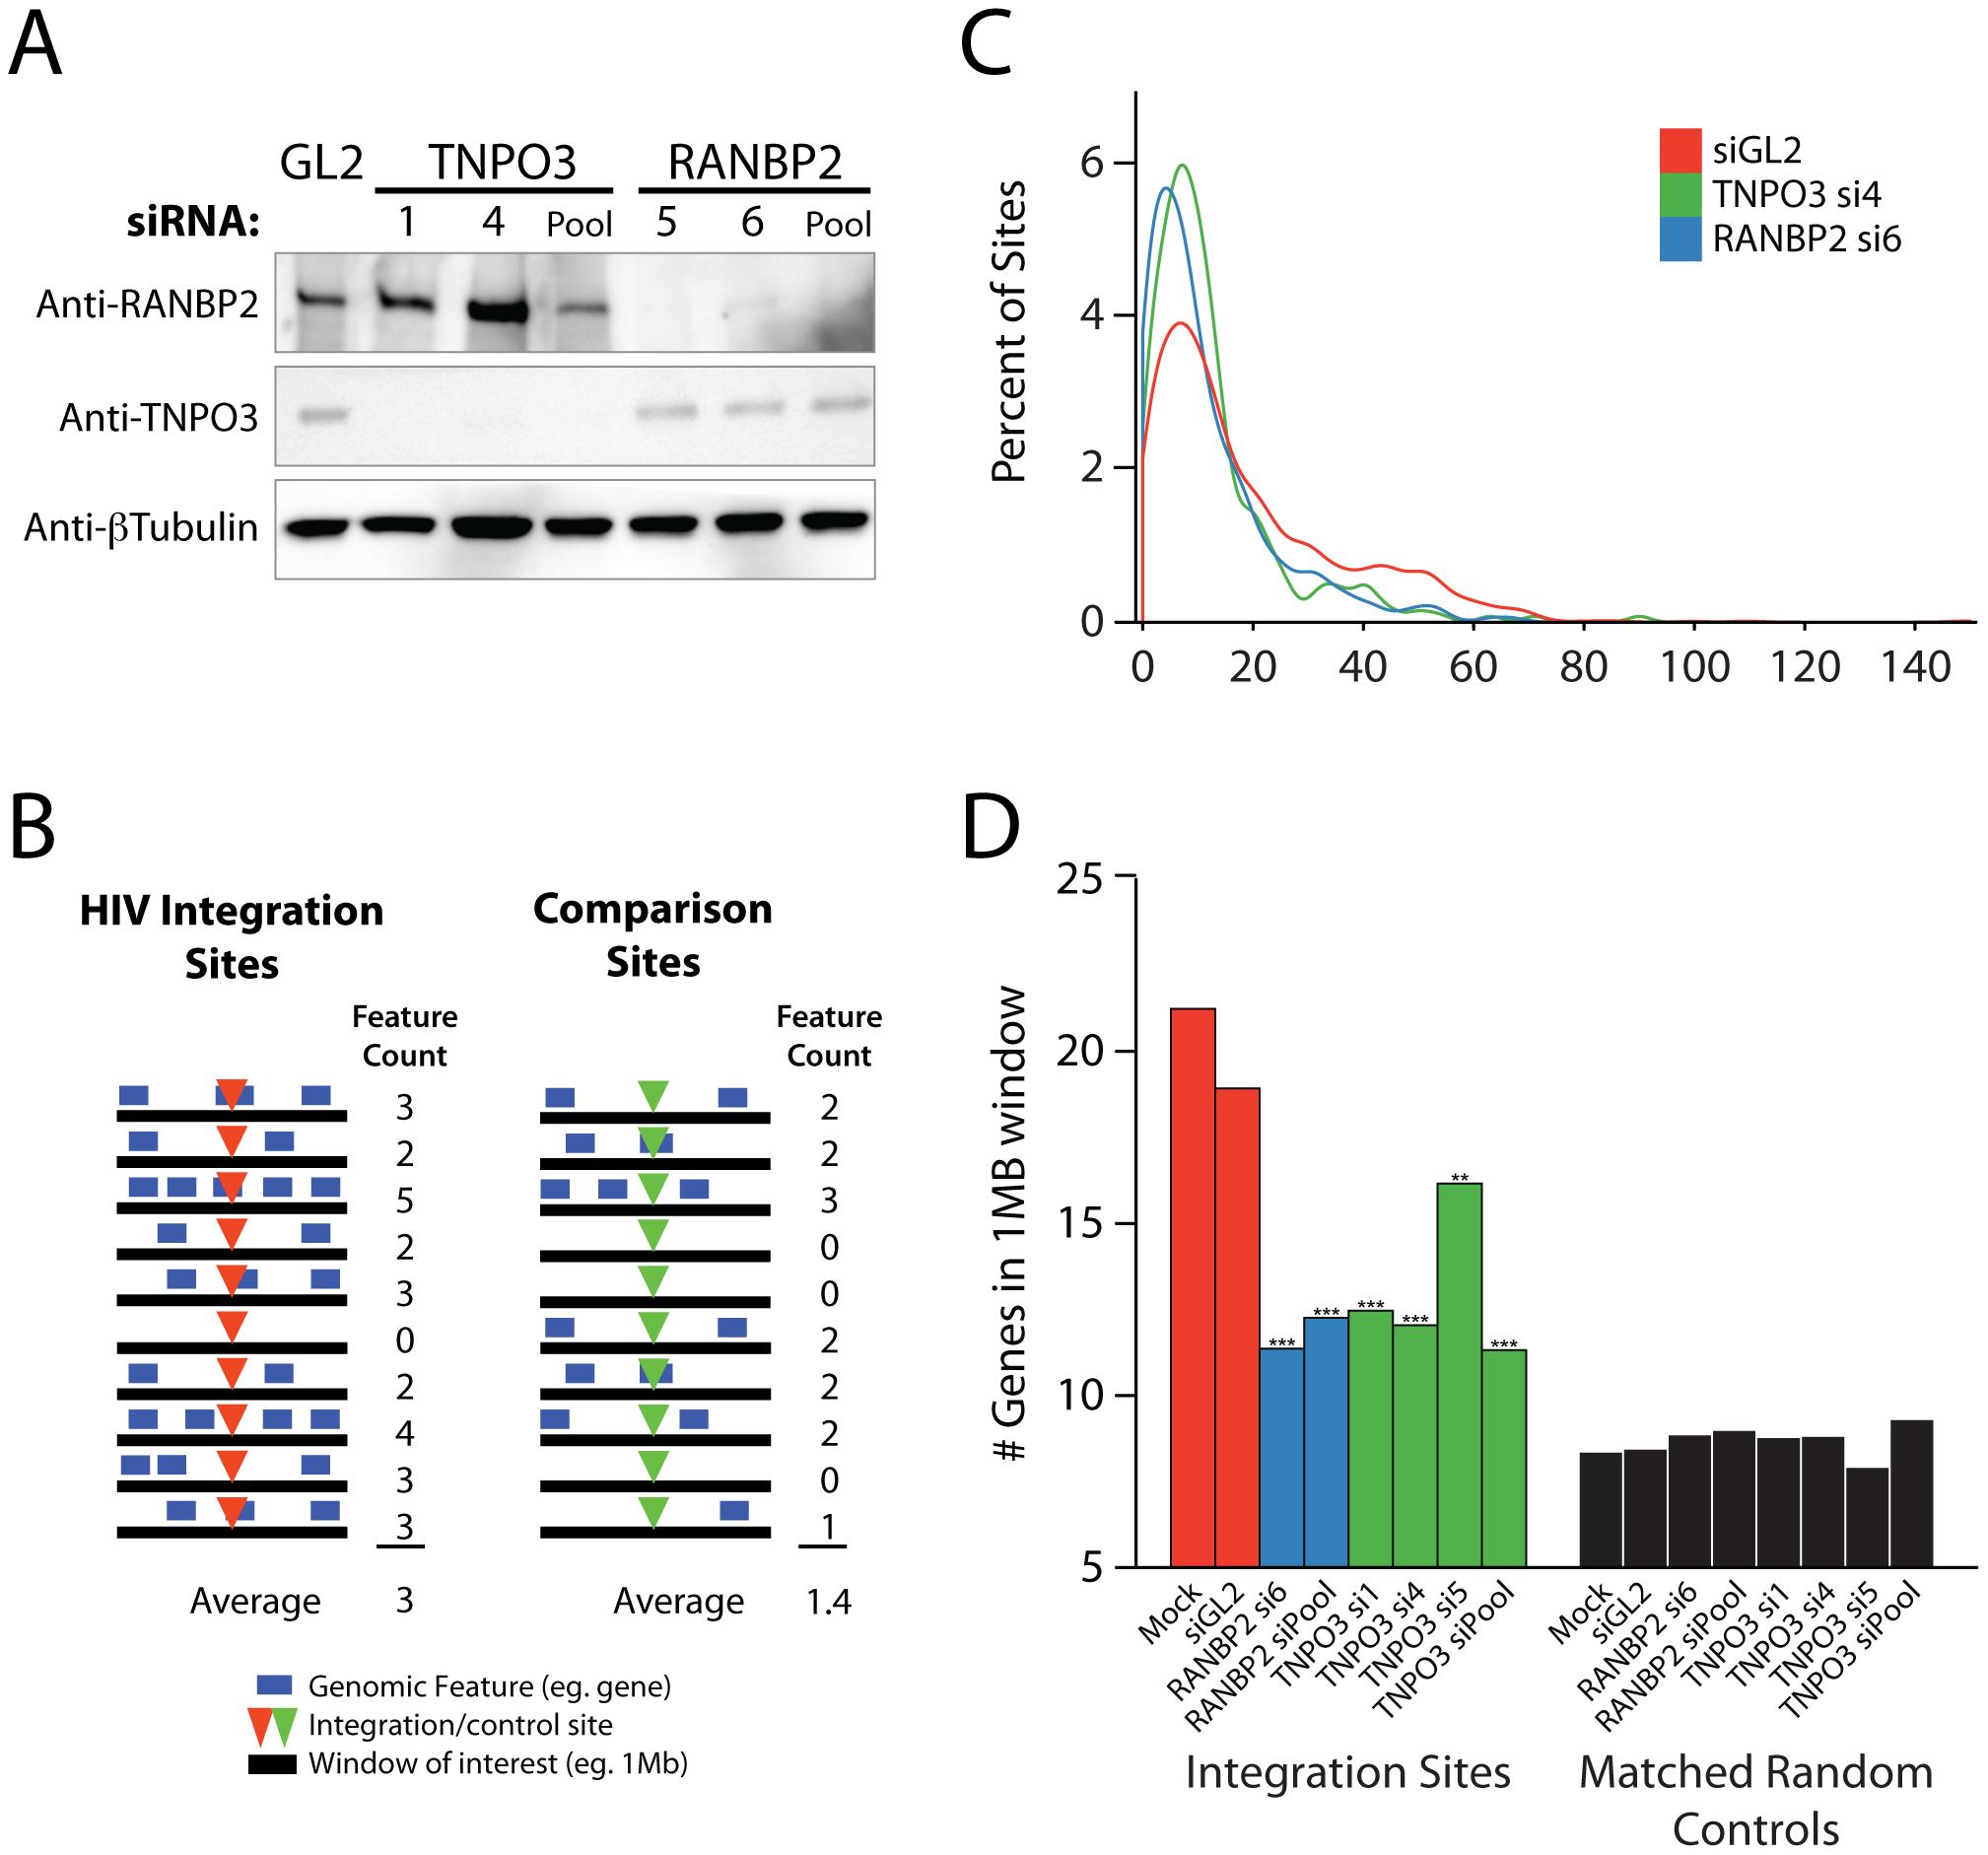 Effects of siRNA treatments on HIV integration in gene dense regions.